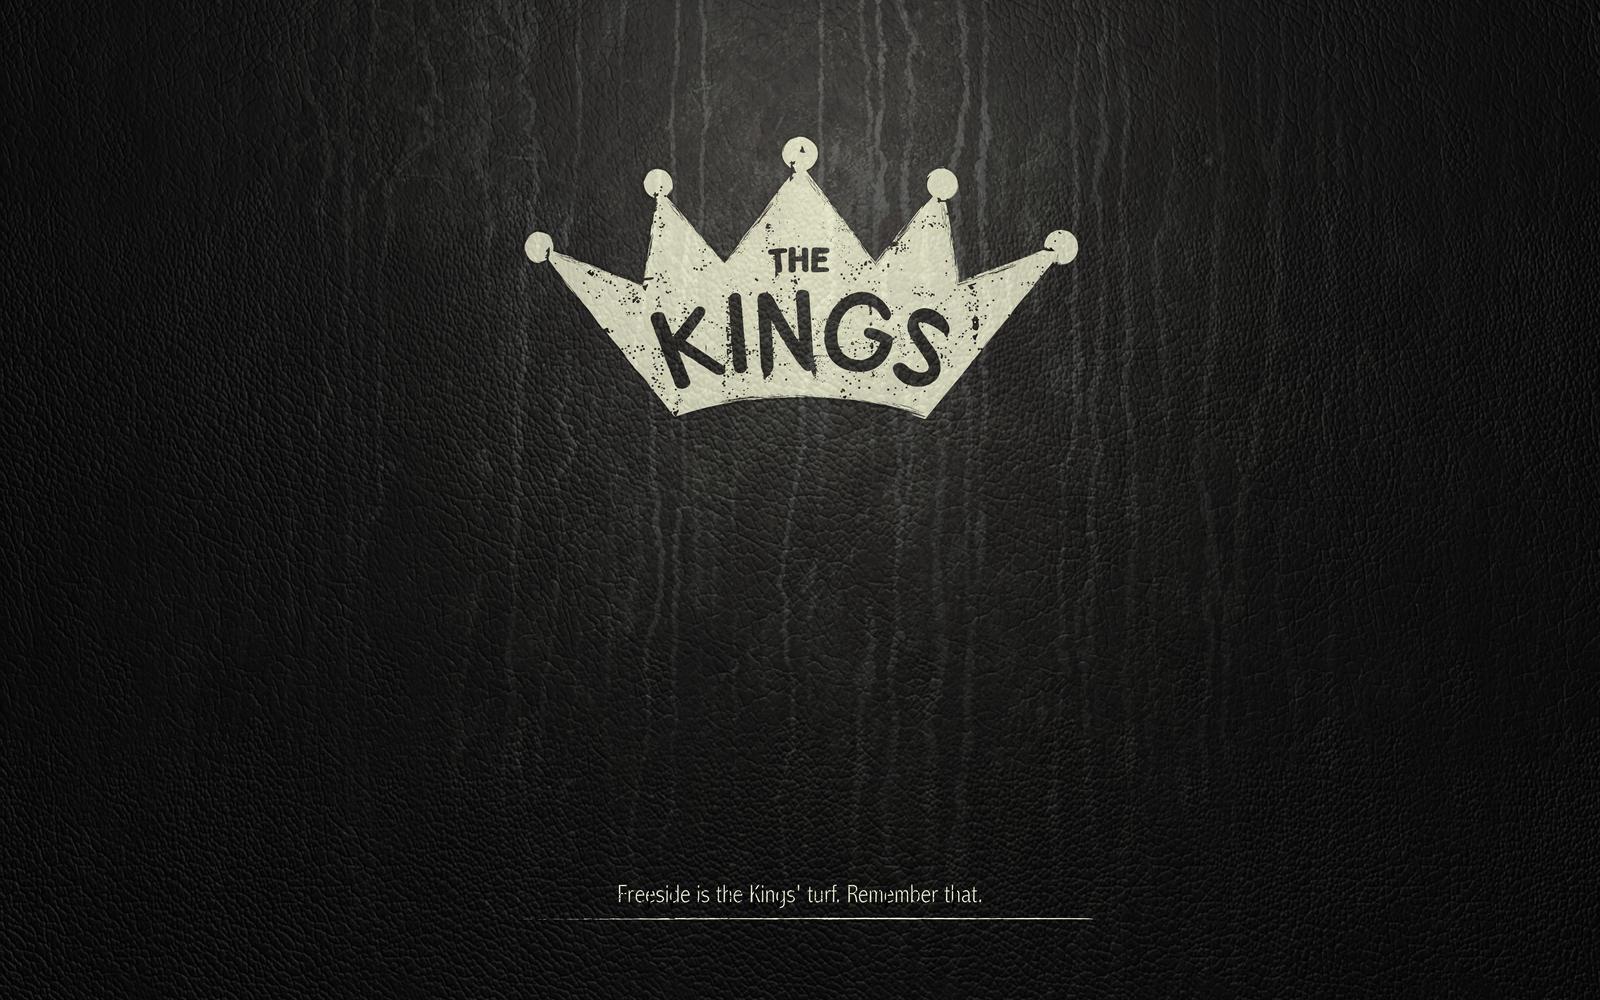 the kings wallpaper by enjauma on deviantart